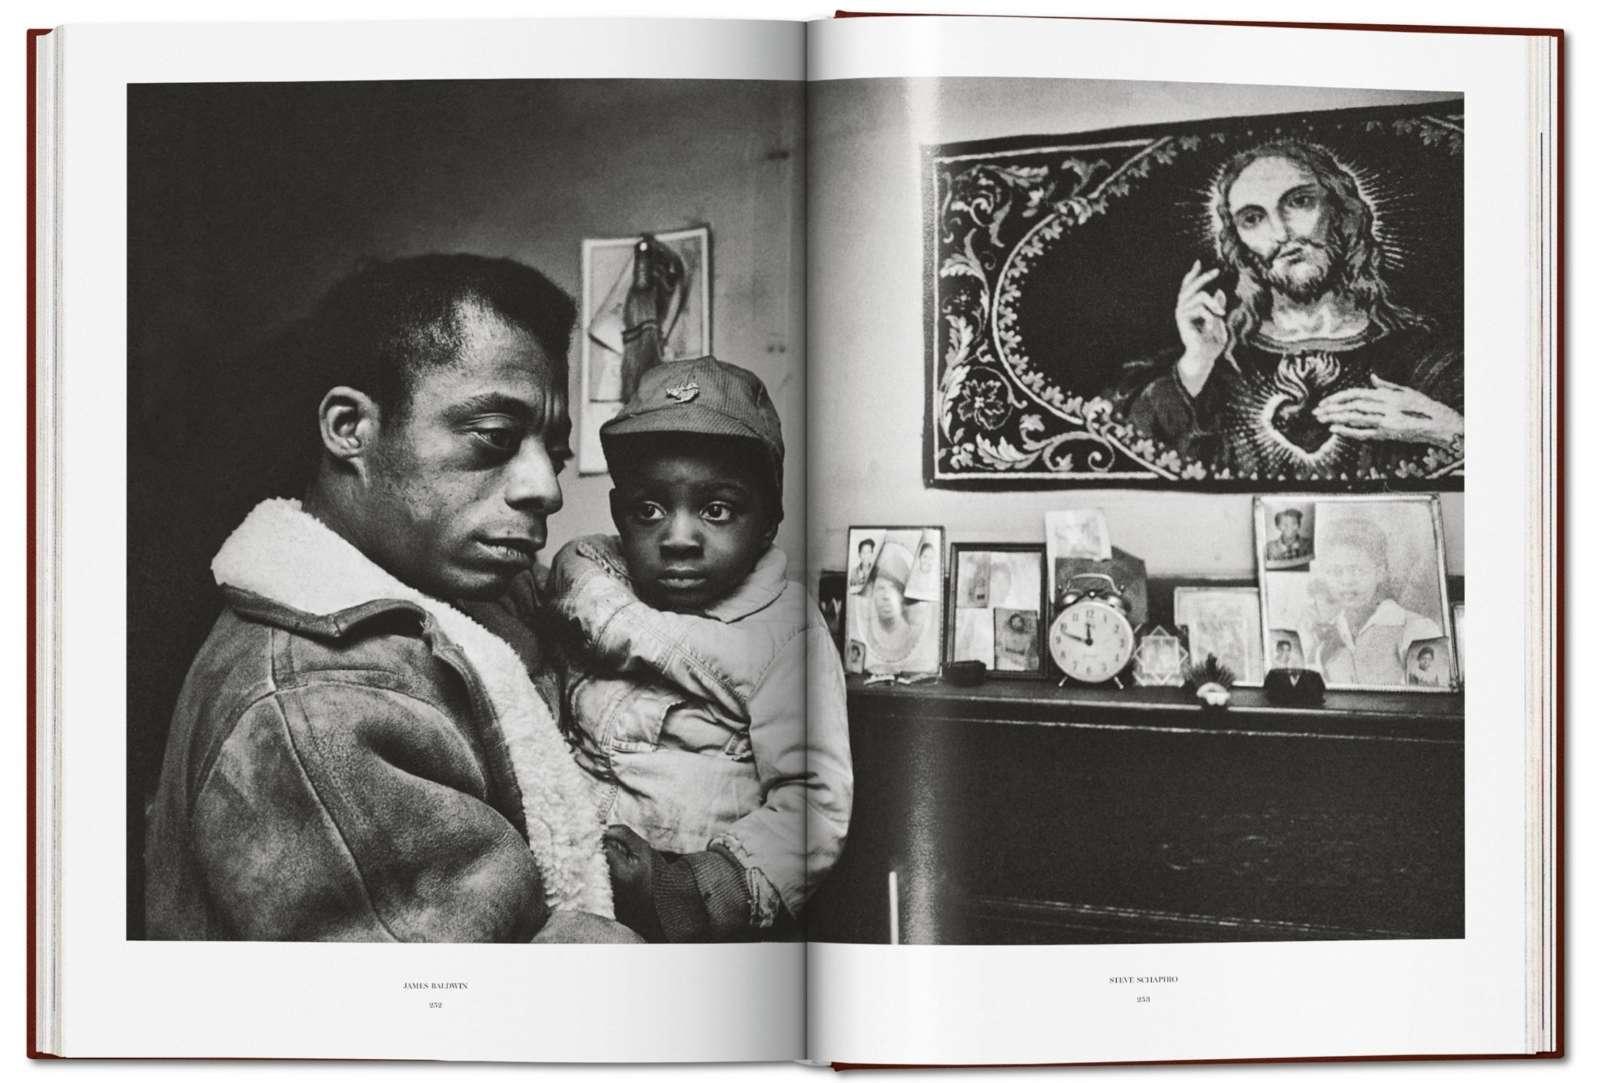 Why James Baldwin's influential work still resonates